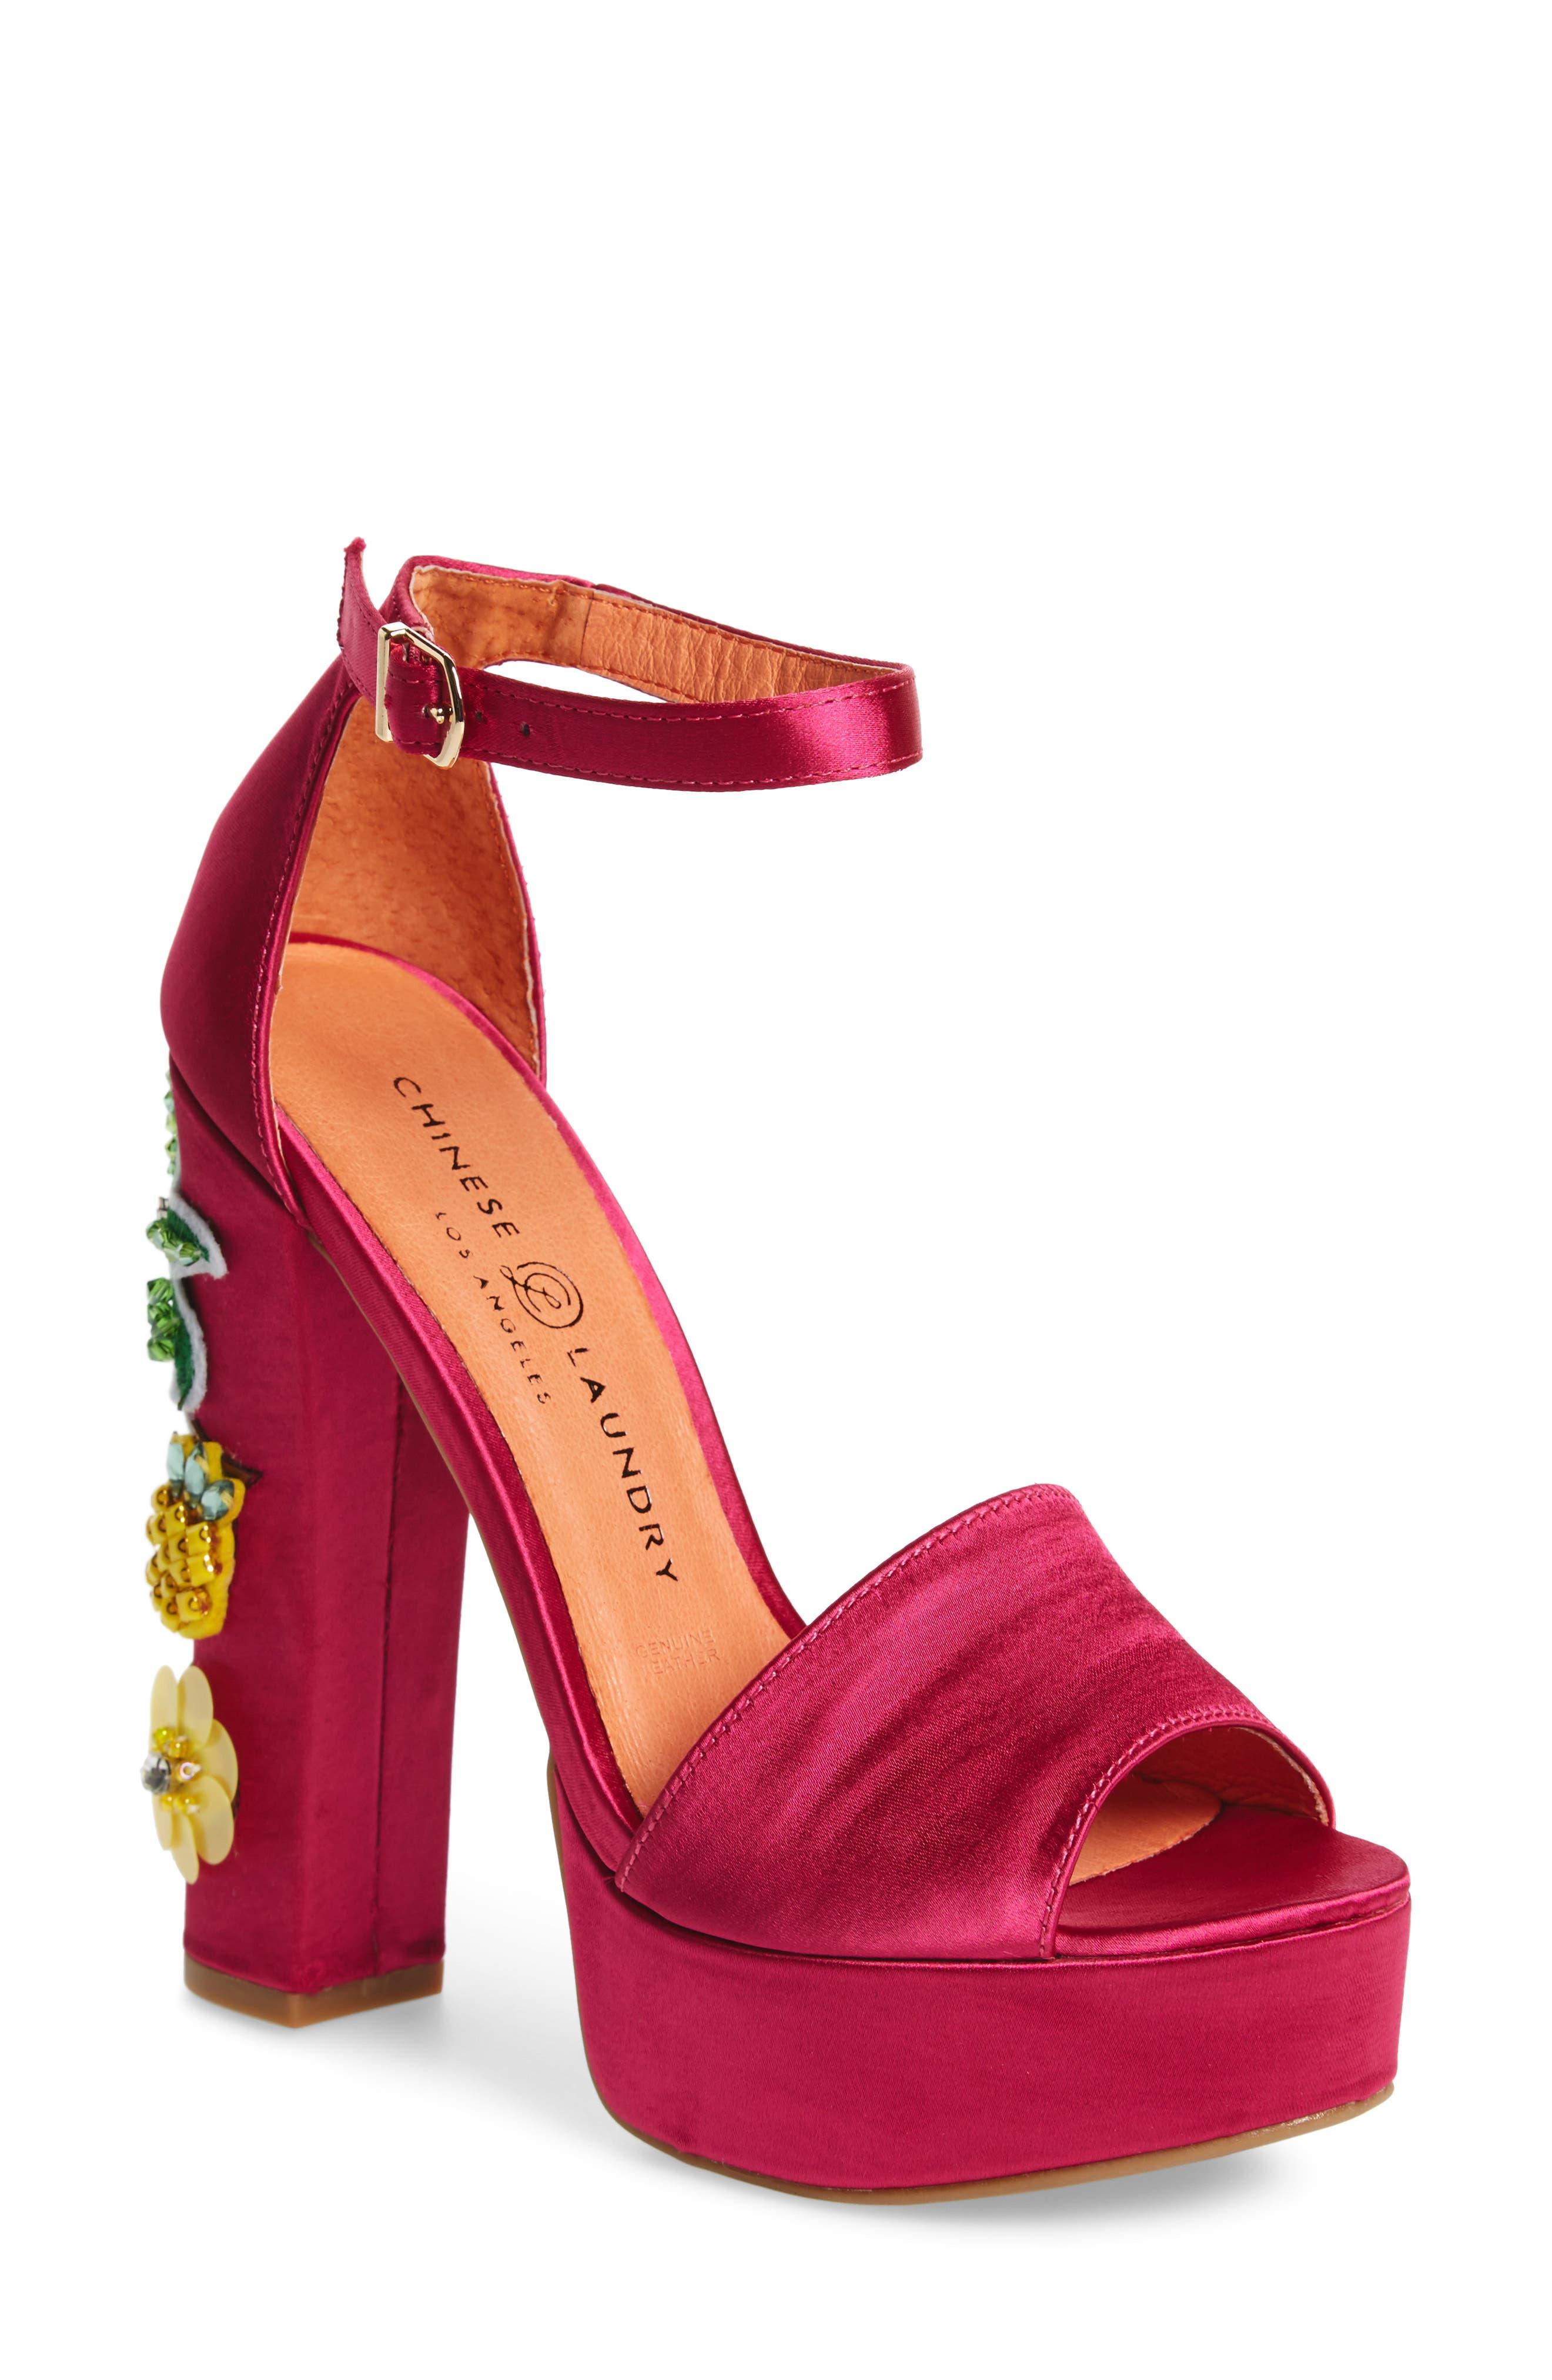 Aloha Embellished Platform Sandal,                             Main thumbnail 1, color,                             Hot Pink